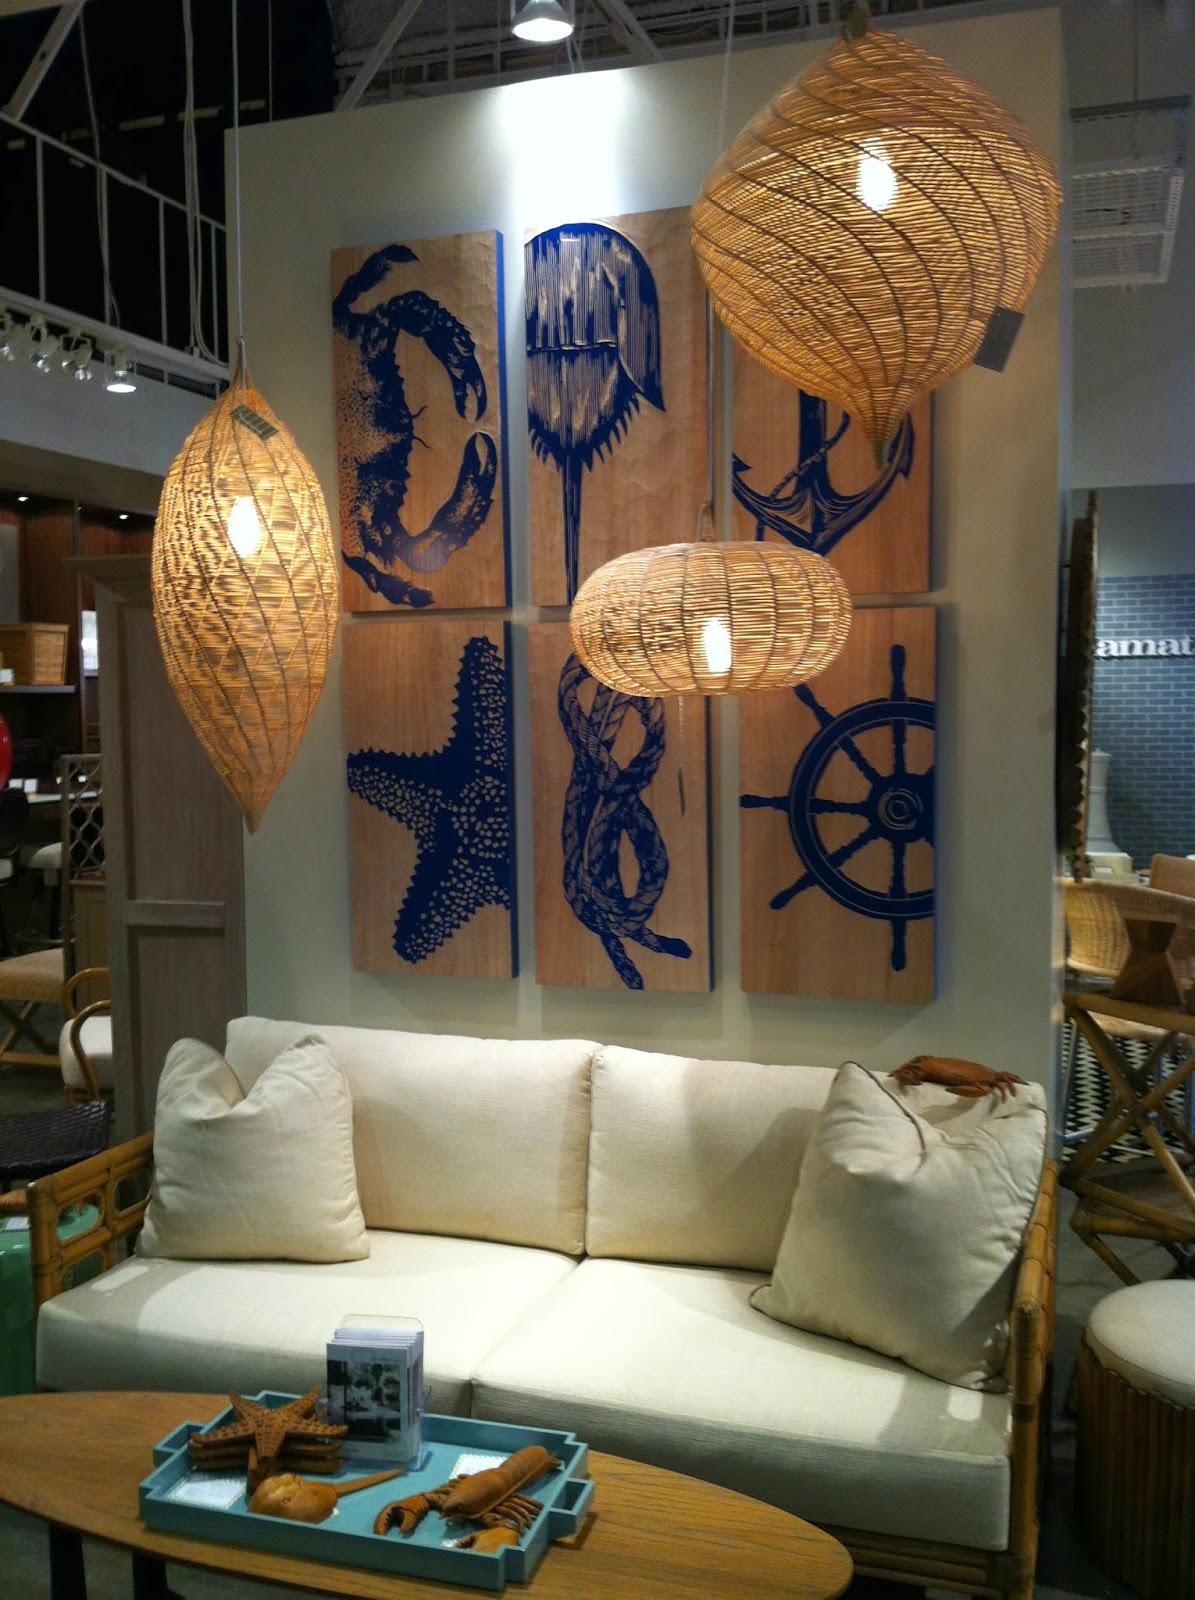 Everything coastal coastal decorating trend nautical anchors and rope patterns - Nautical rope decorating ideas ...